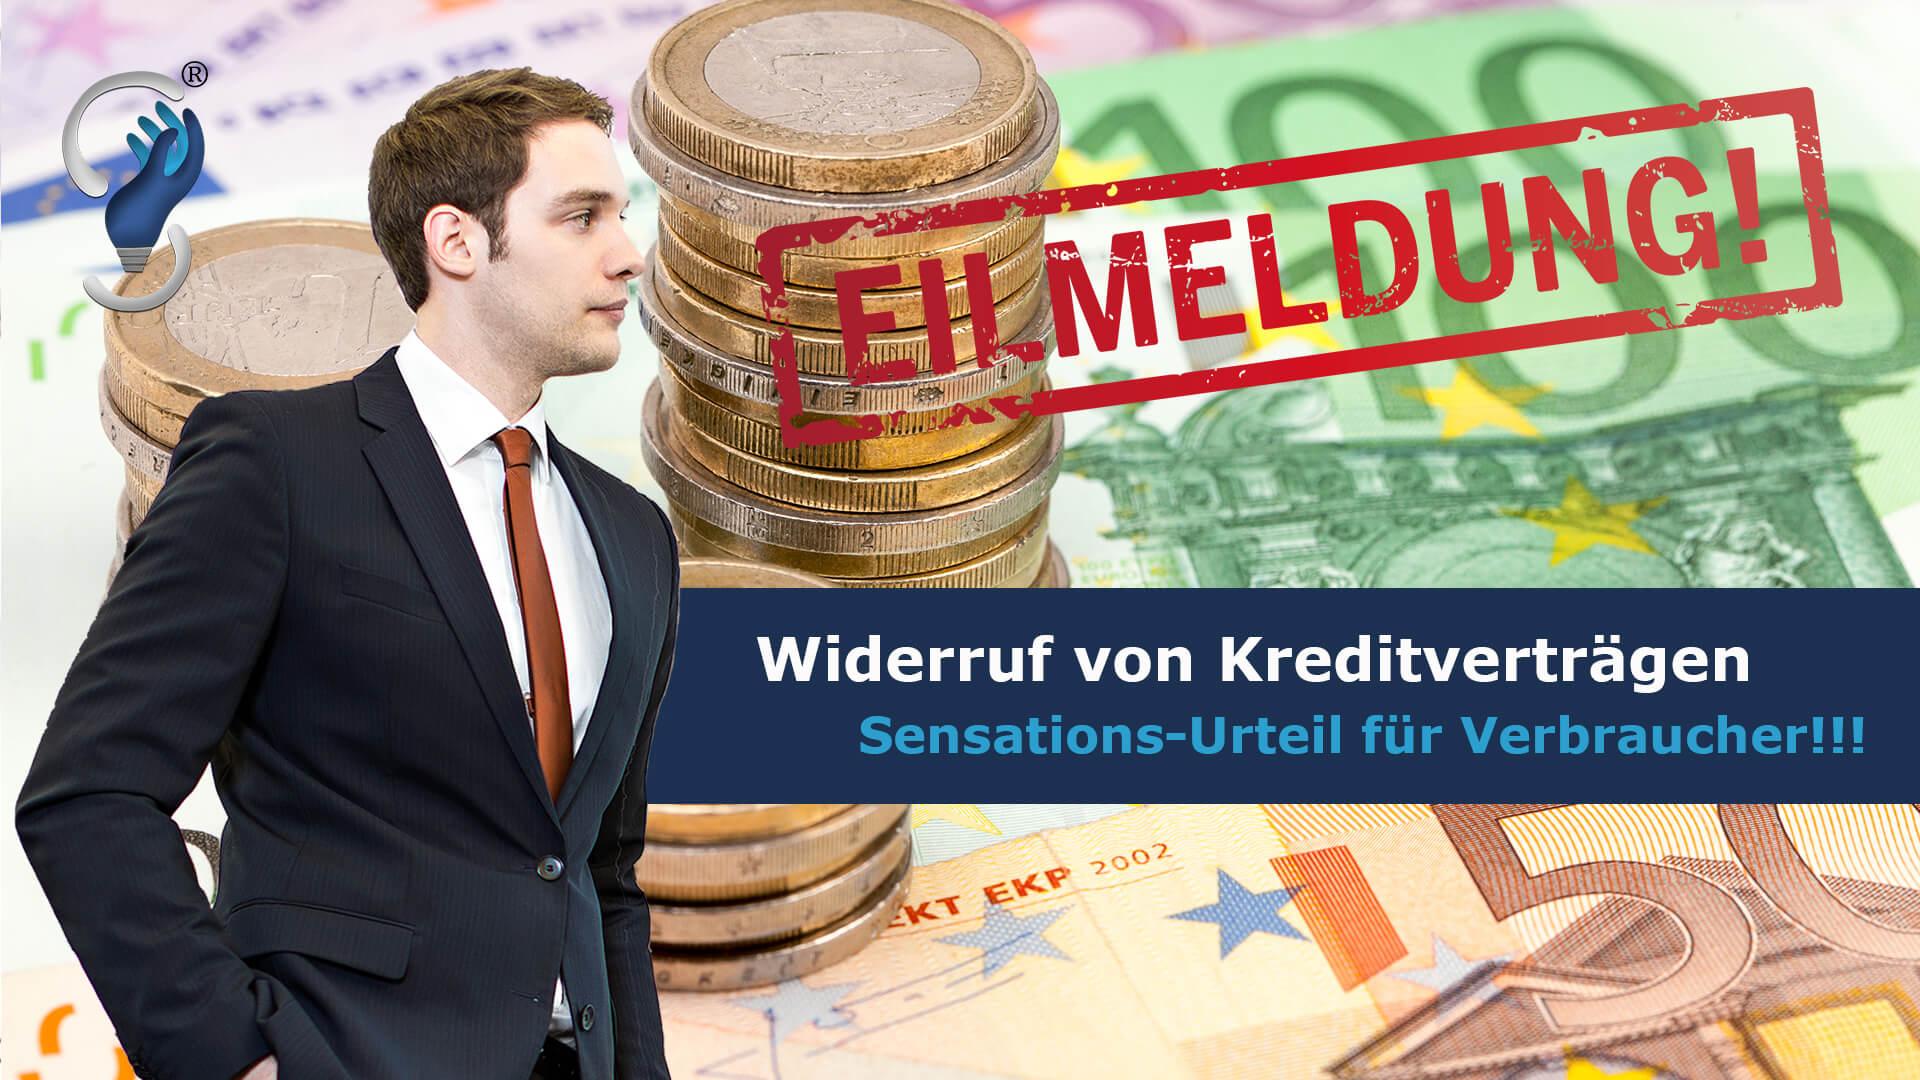 Kredit Widerruf Kreditvertrag autokredit Hauskredit Anwalt Rechtsanwalt Kanzlei EuGH Hamburg Norderstedt